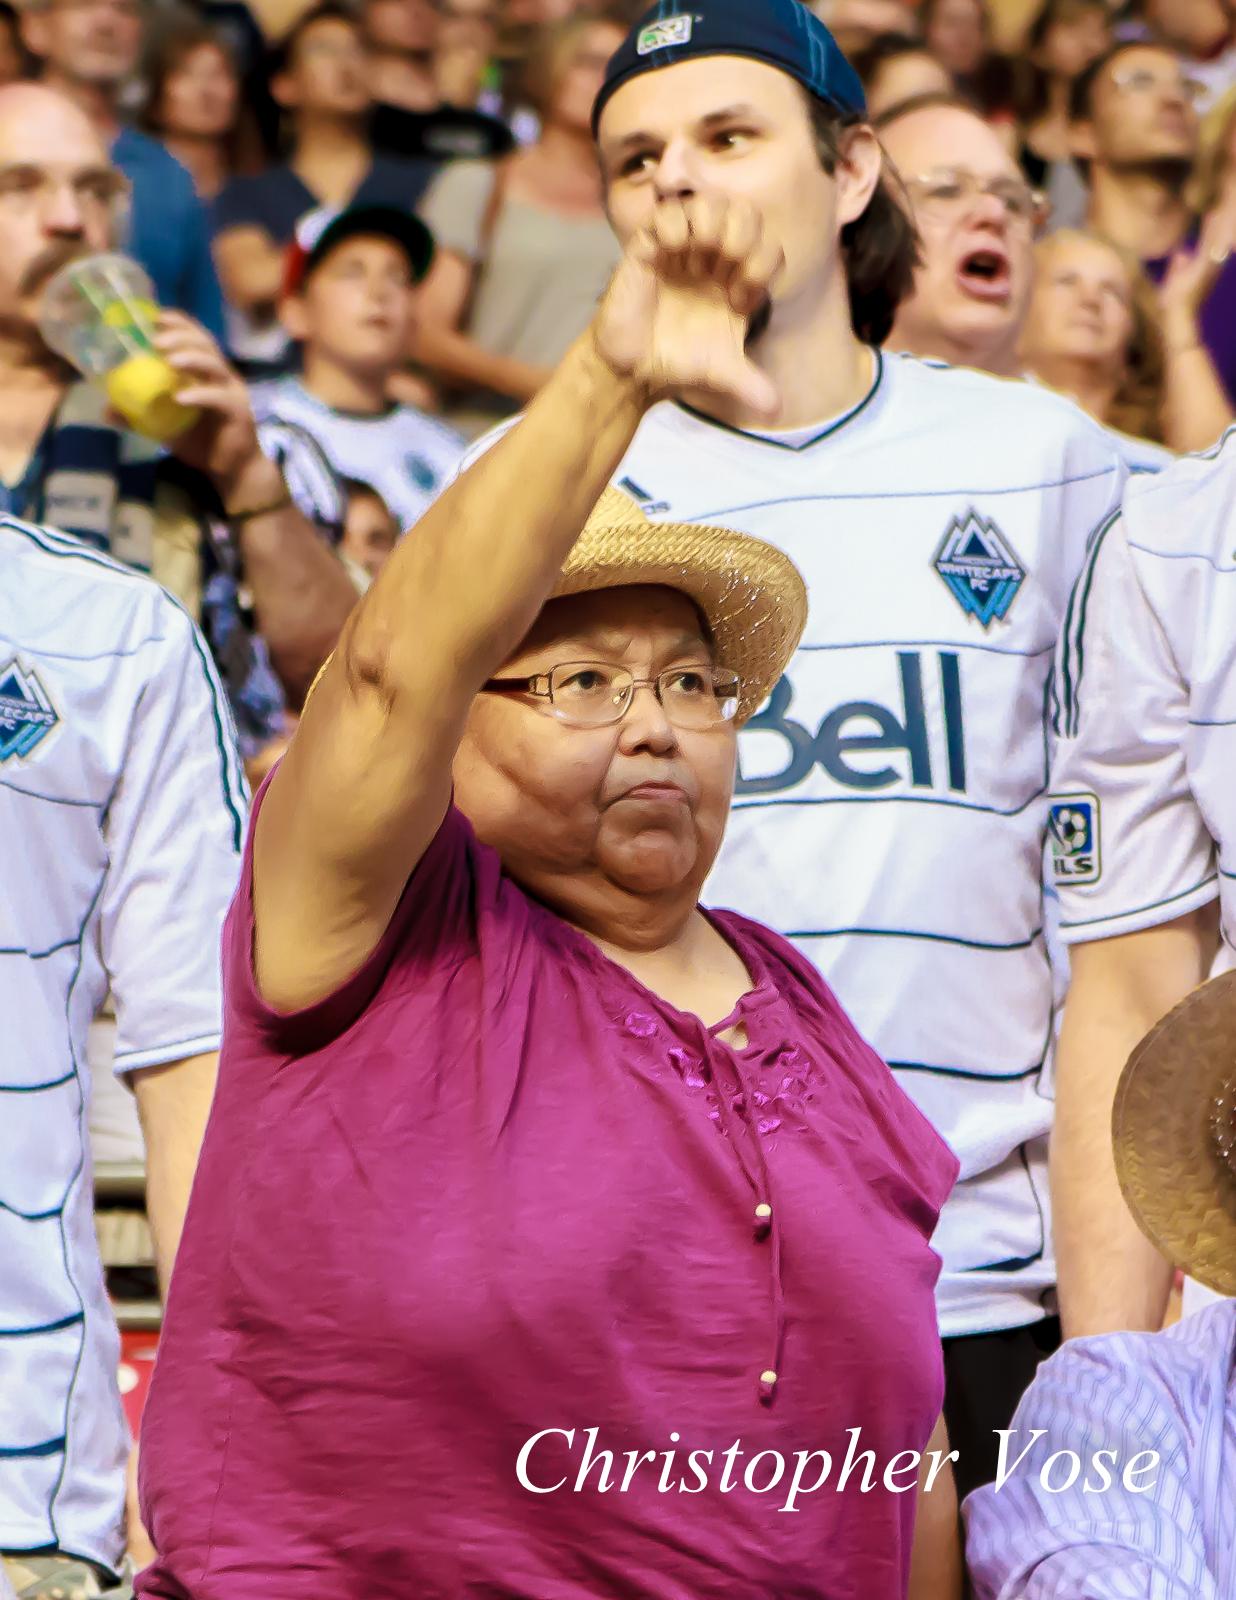 2014-07-12 Vancouver Whitecaps FC Supporter Goal Reaction (Torres).jpg